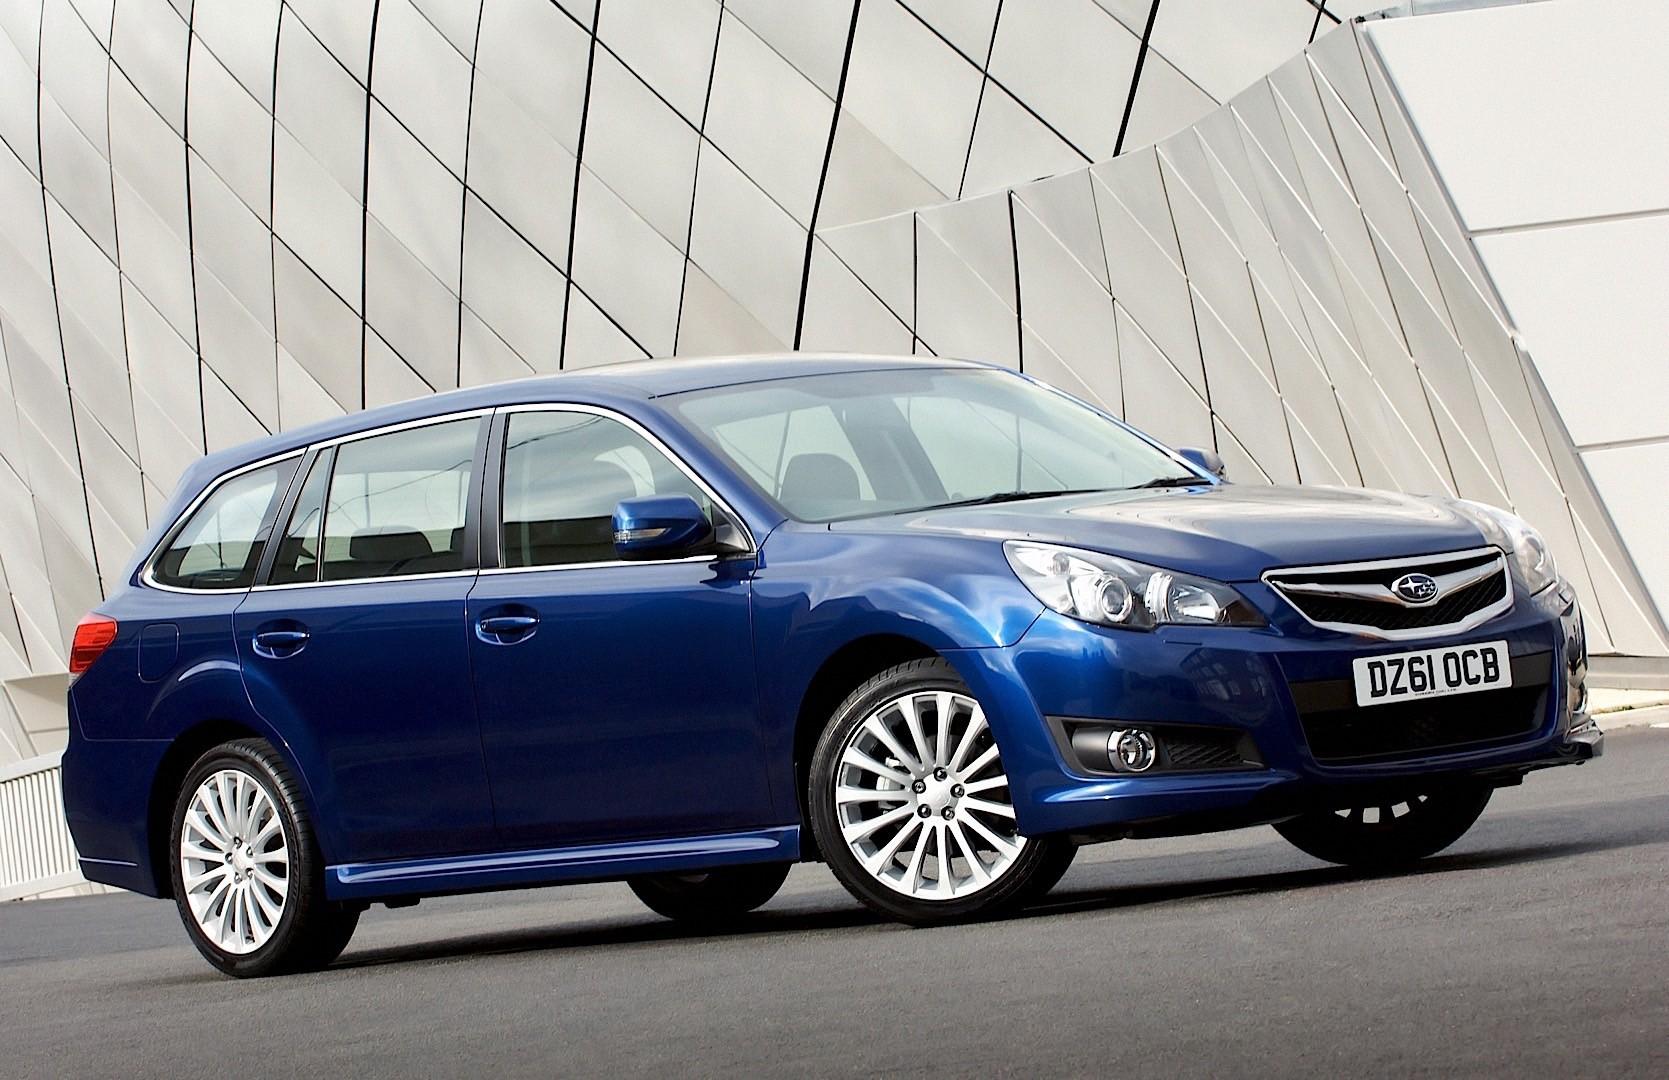 Subaru legacy wagon specs 2009 2010 2011 2012 2013 2014 subaru legacy wagon 2009 present vanachro Images